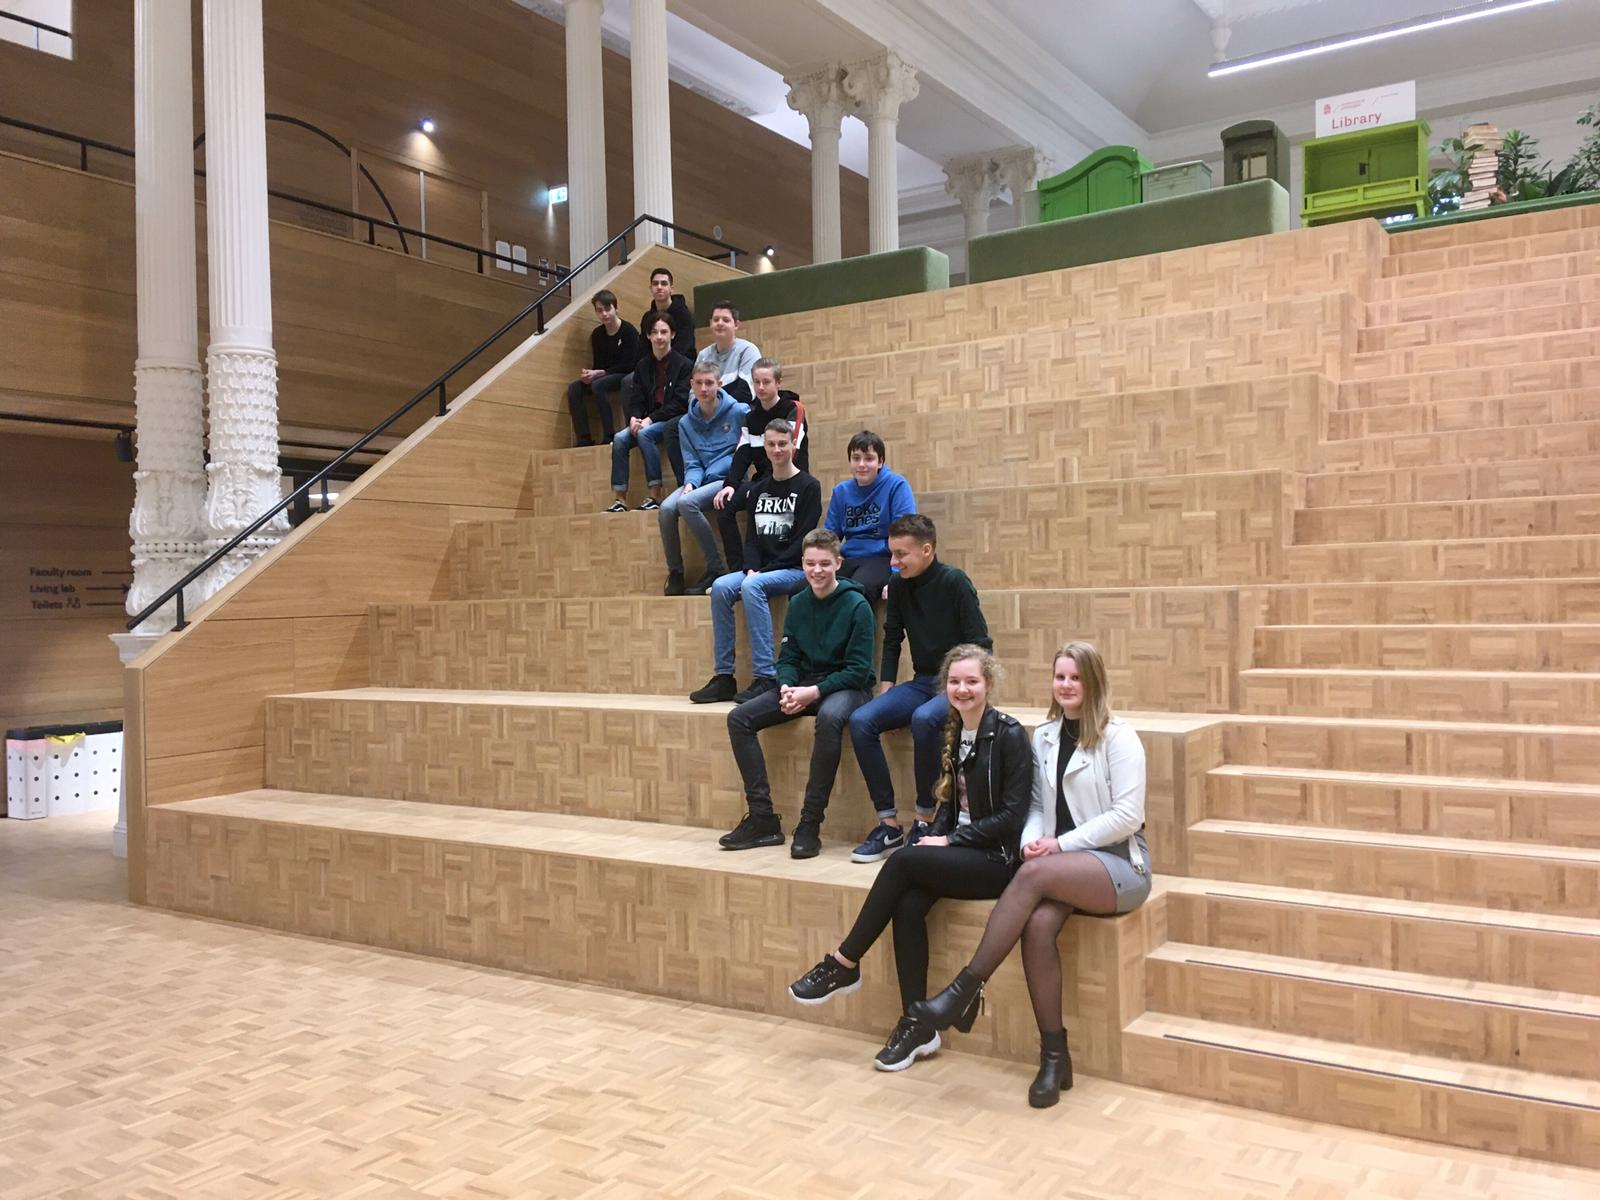 Scholieren uit Tytsjerksteradiel op Campus Fryslân